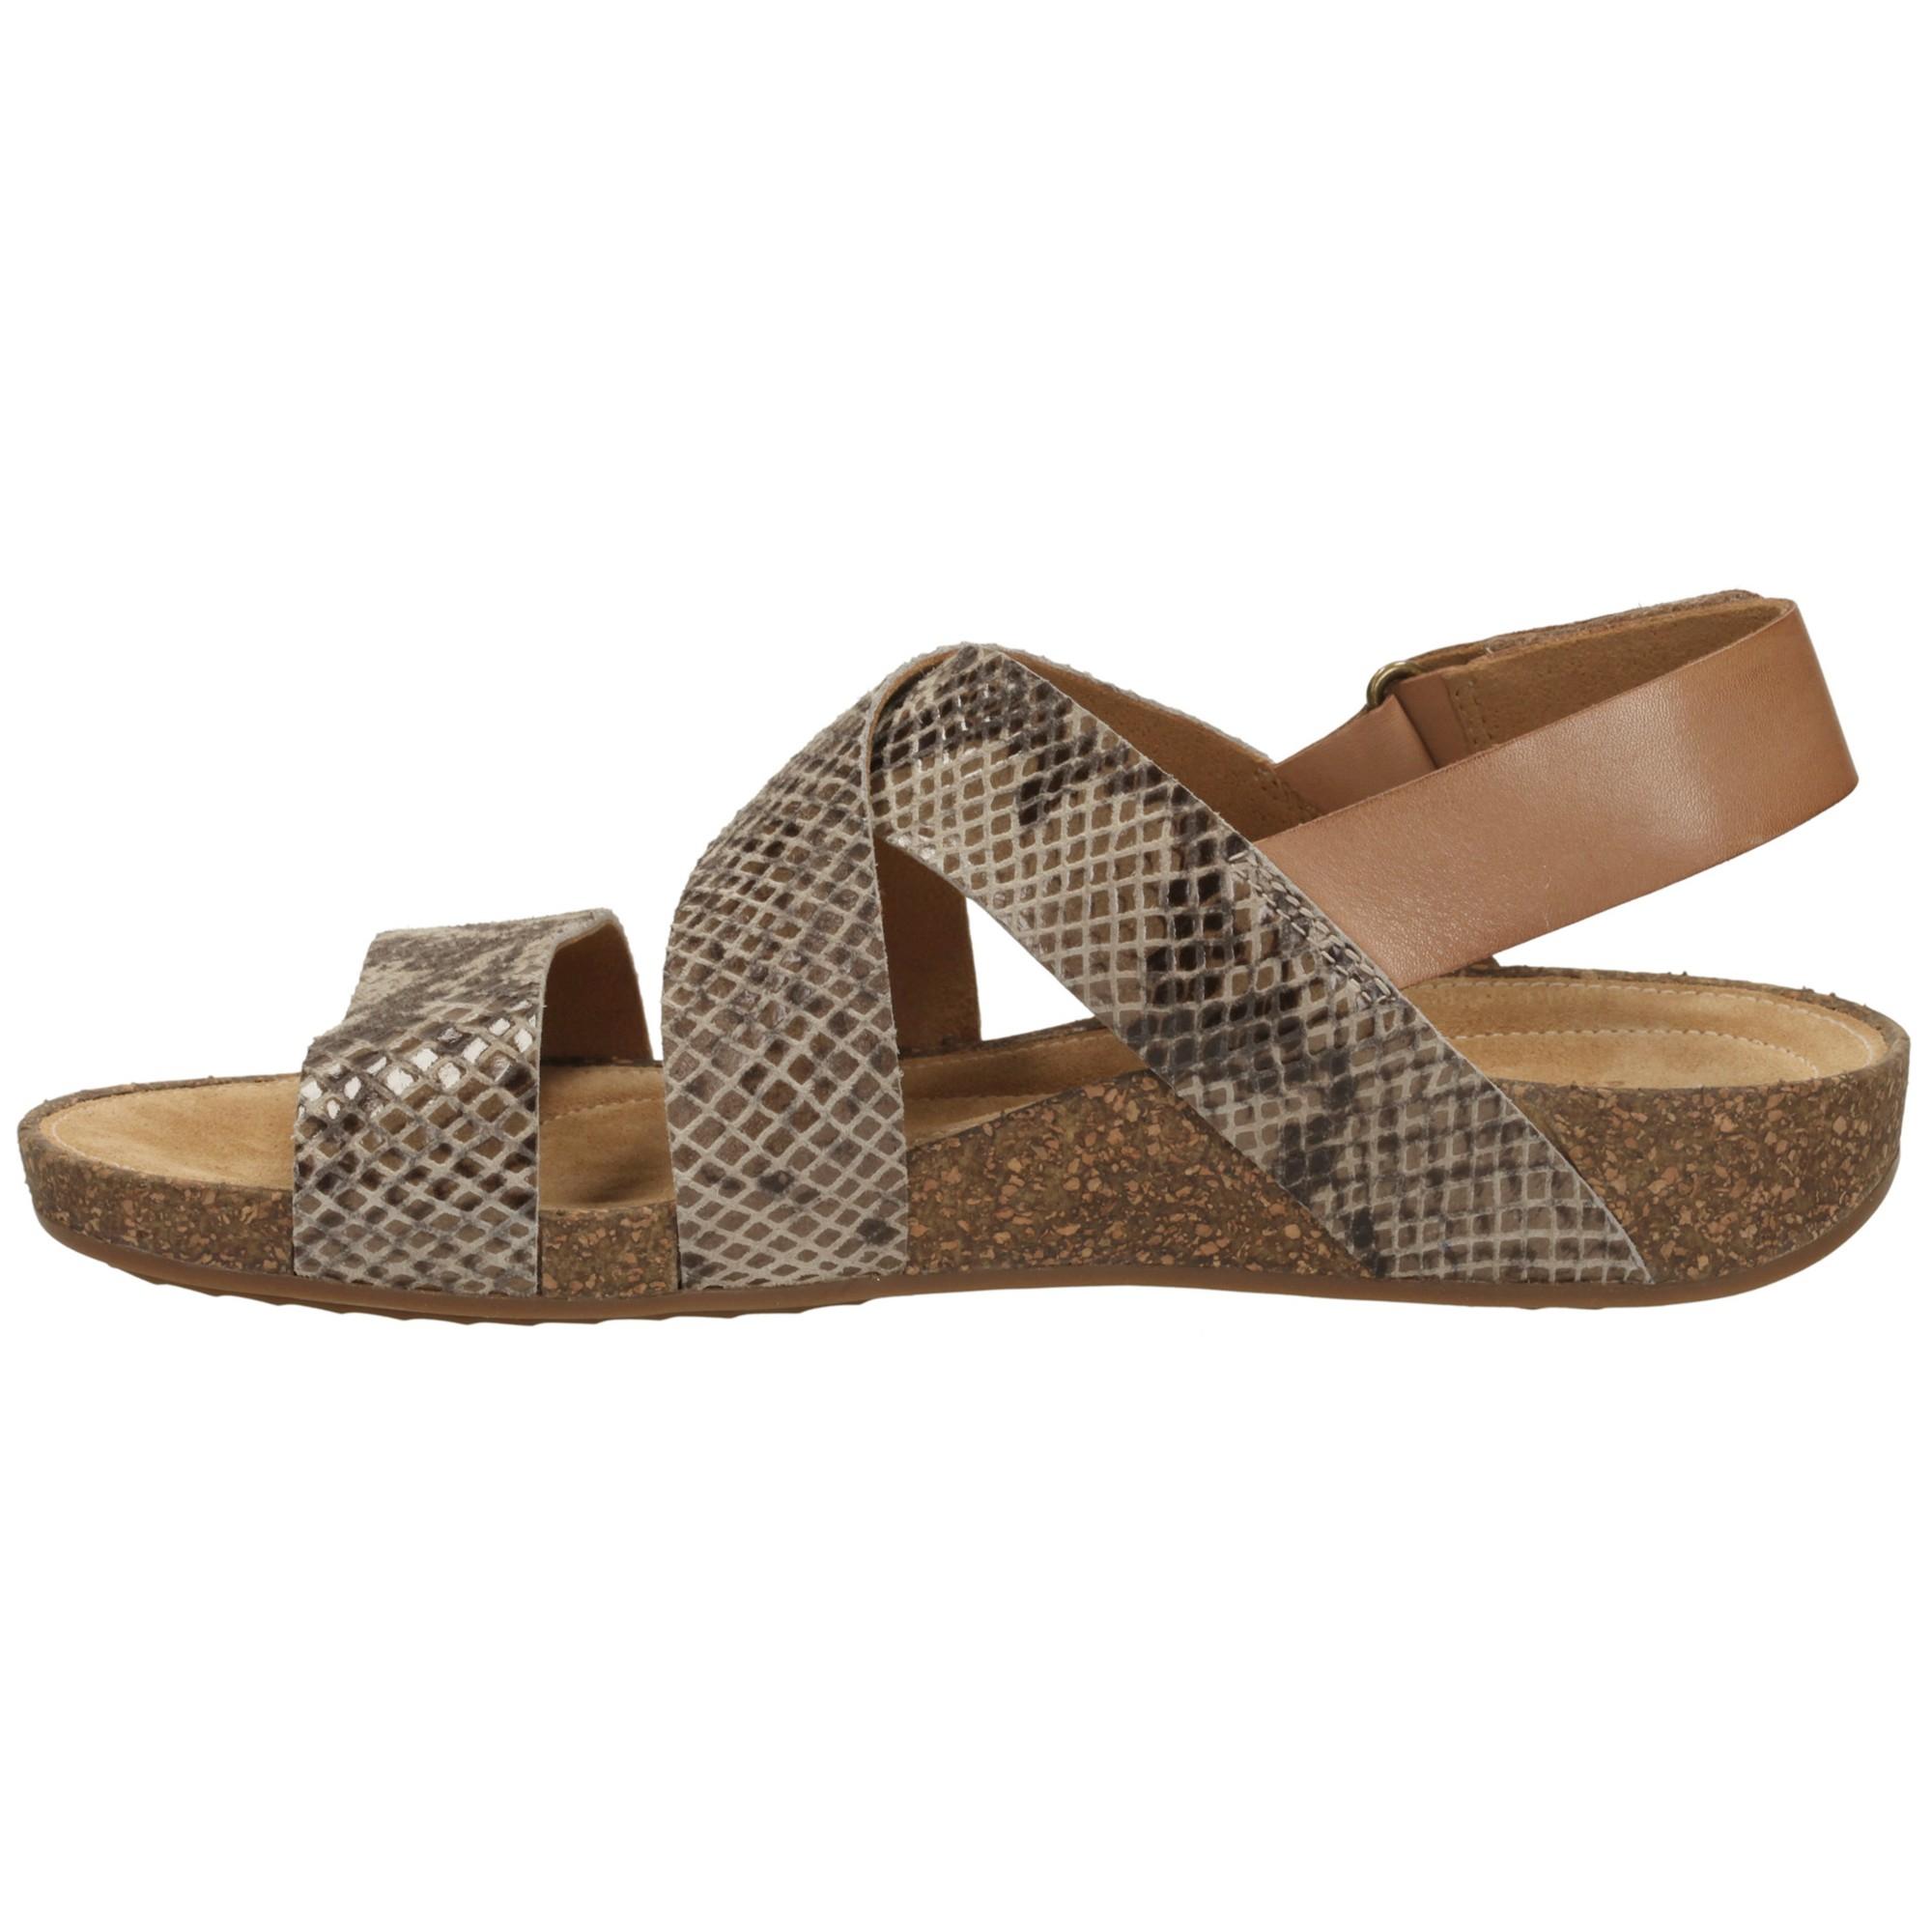 fd9827a47d2c2 Clarks Perri Dunes Suede Snake Sandals in Brown - Lyst